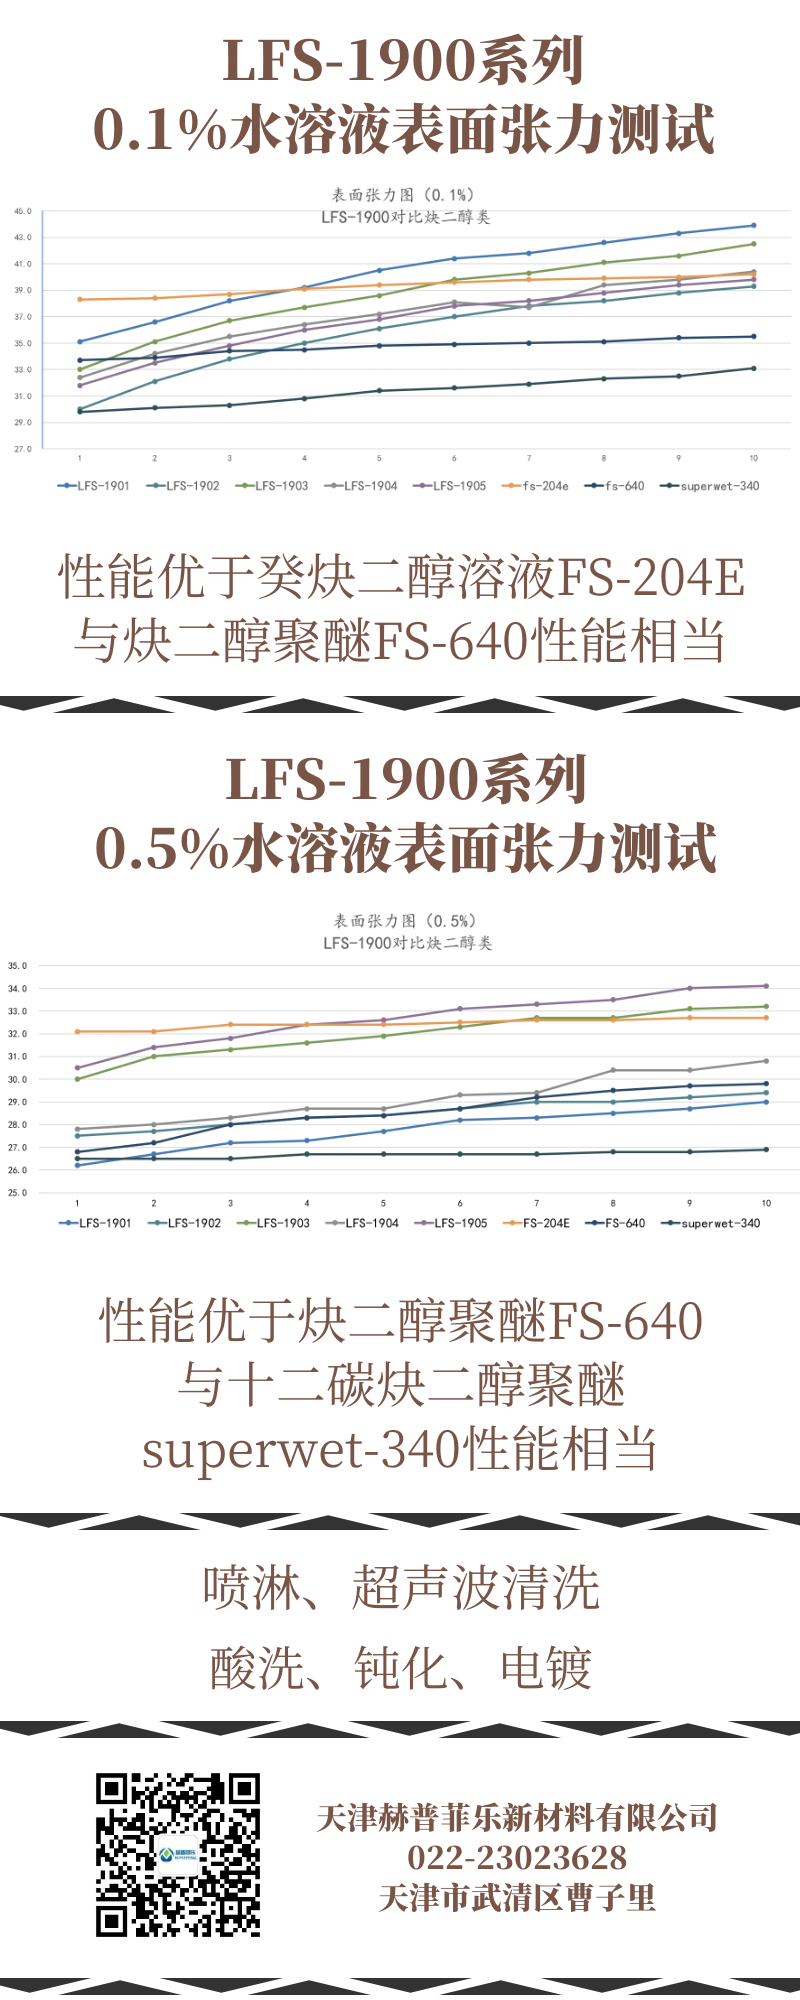 LFS-1900產品介紹2.png